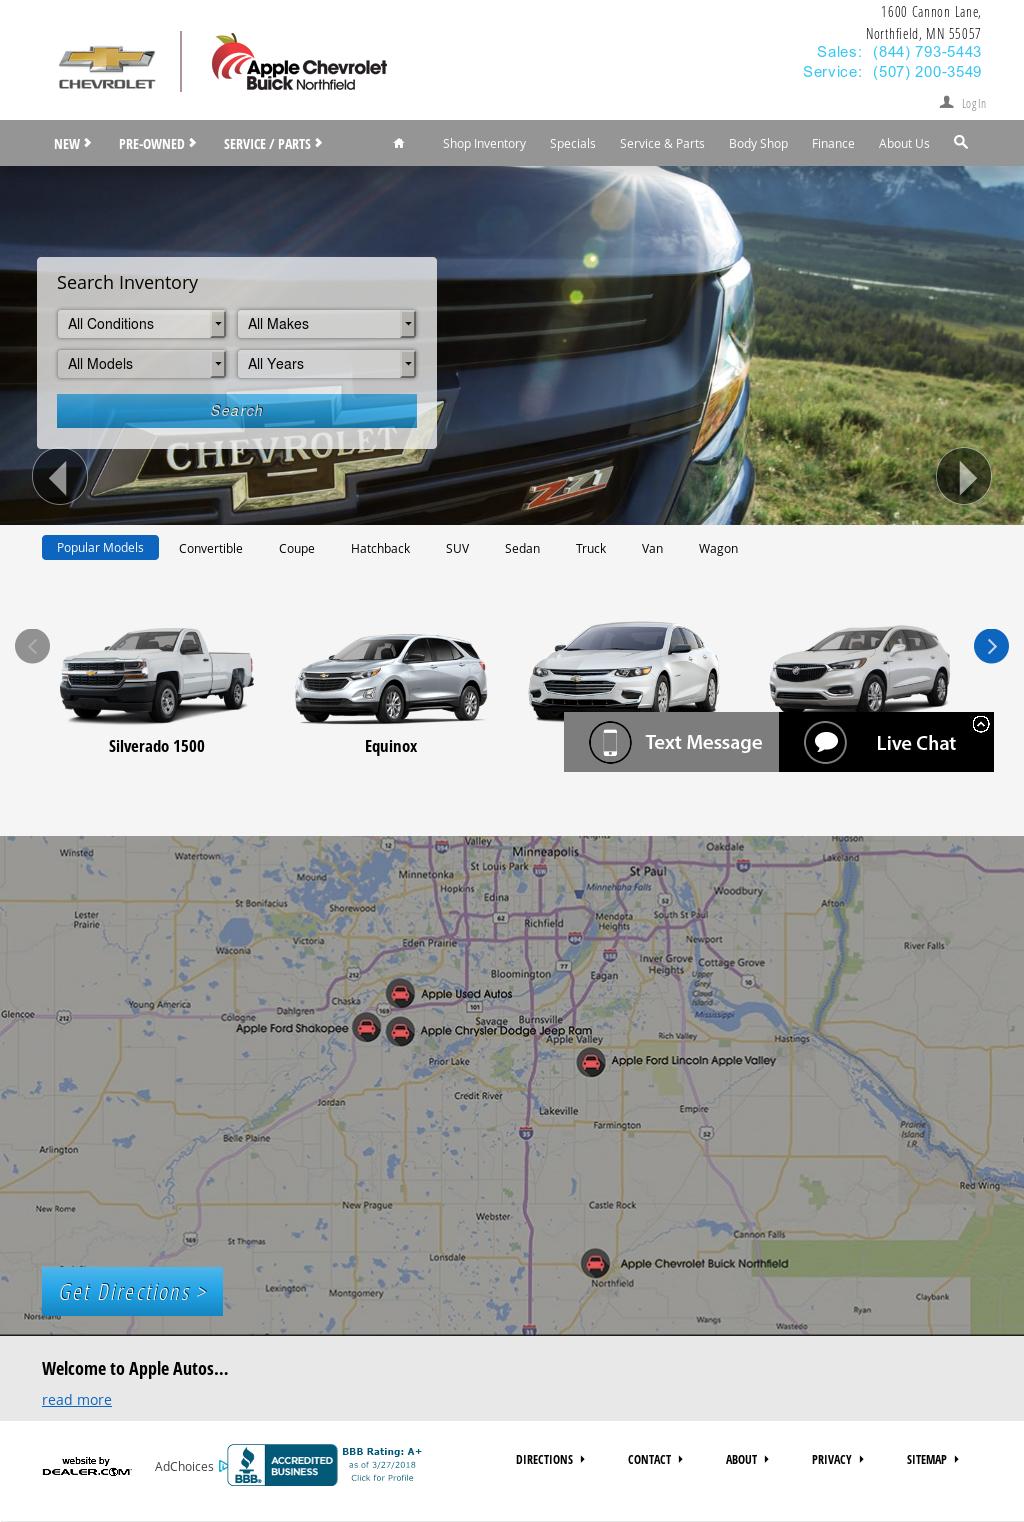 Apple Chevrolet Buick Northfield Website History